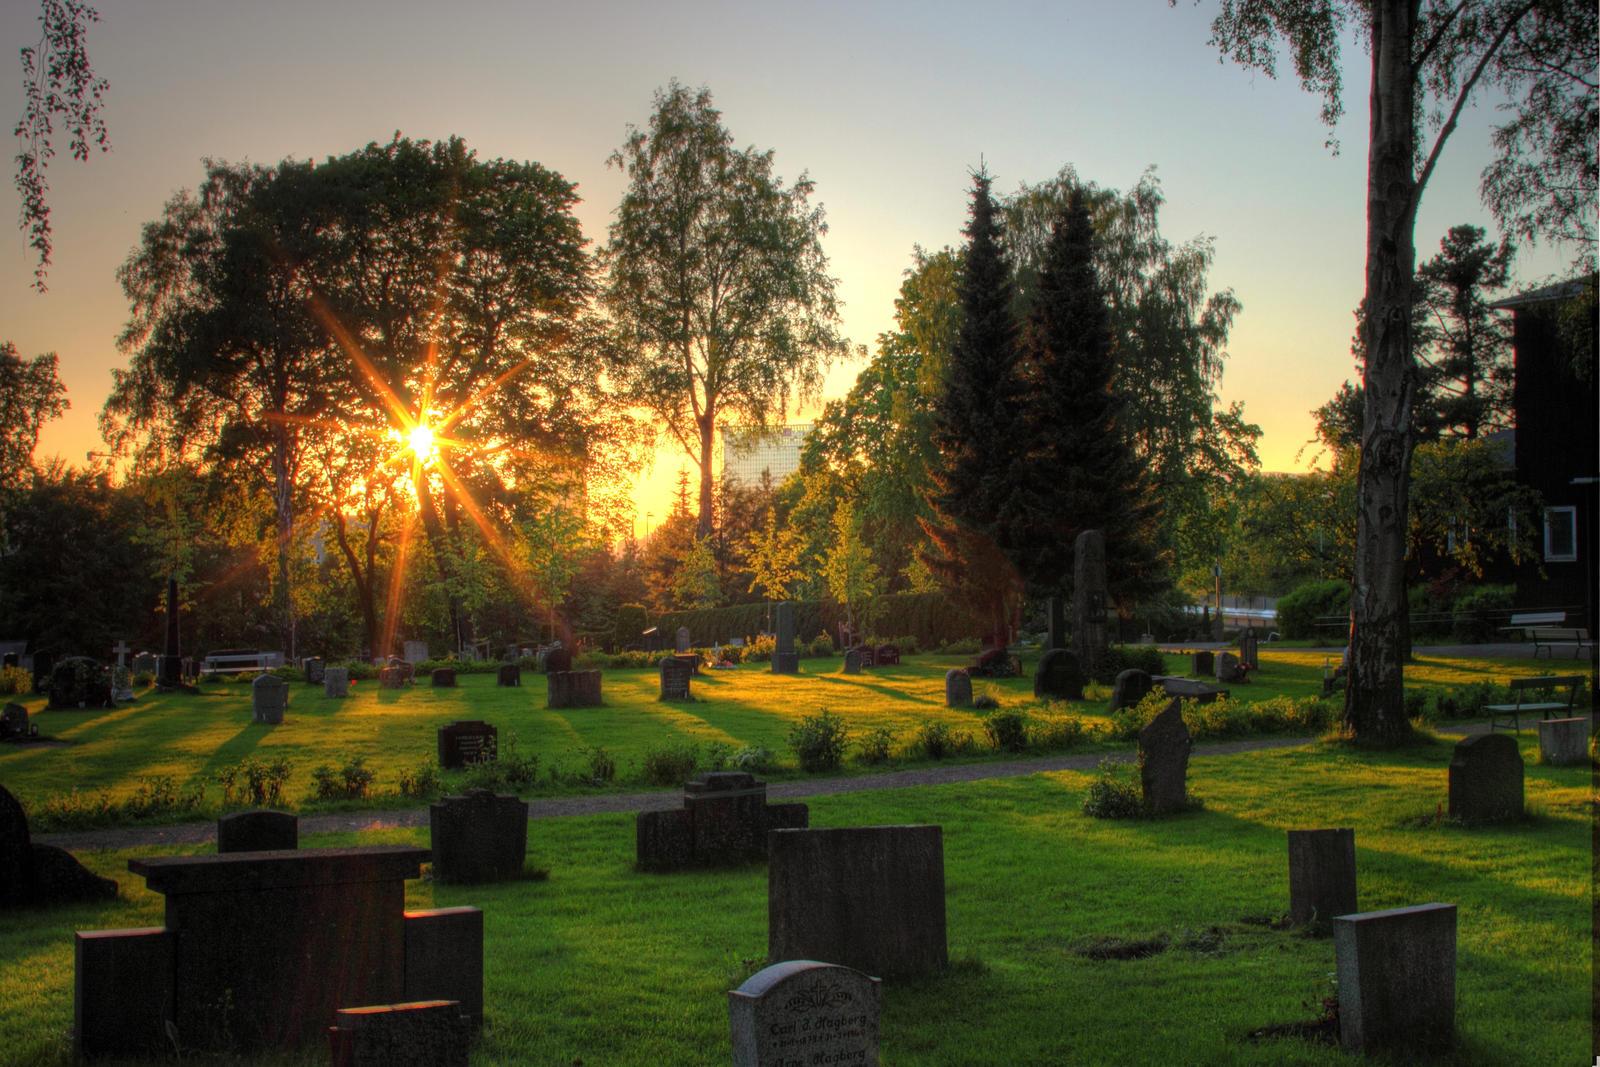 Cemetery in sunset 2 by mariusjellum